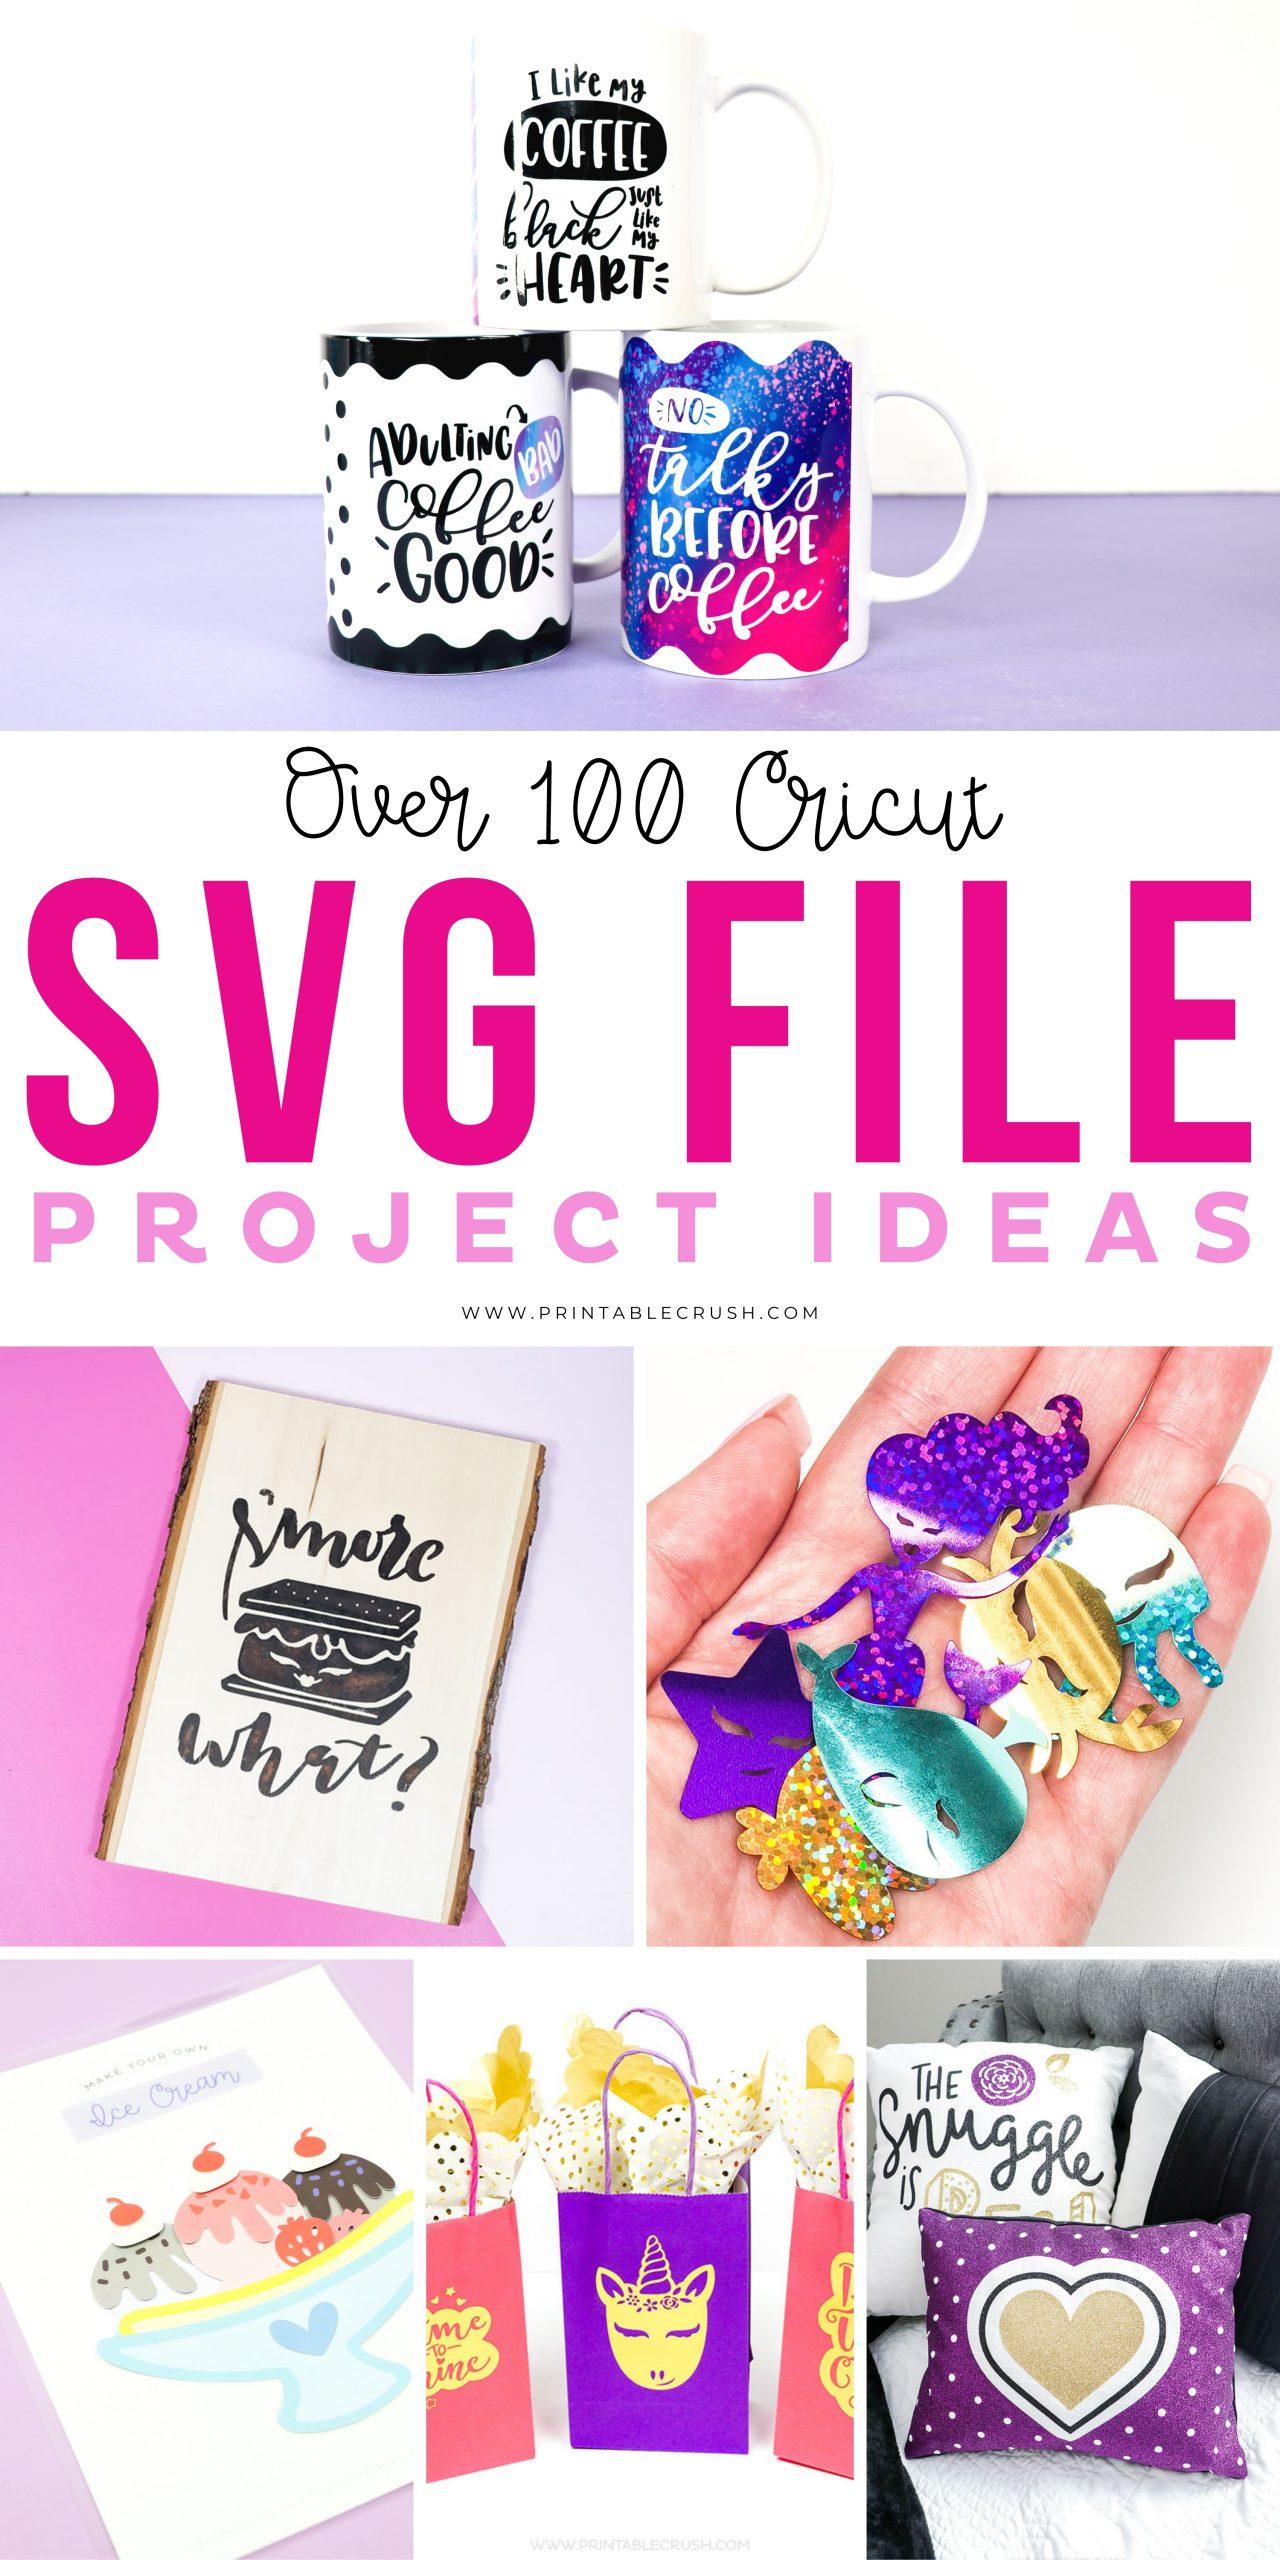 Over 100 Cricut SVG File Project Ideas - Ideas for Cricut Machine - Holiday Cricut Projects - Printable Crush via @printablecrush